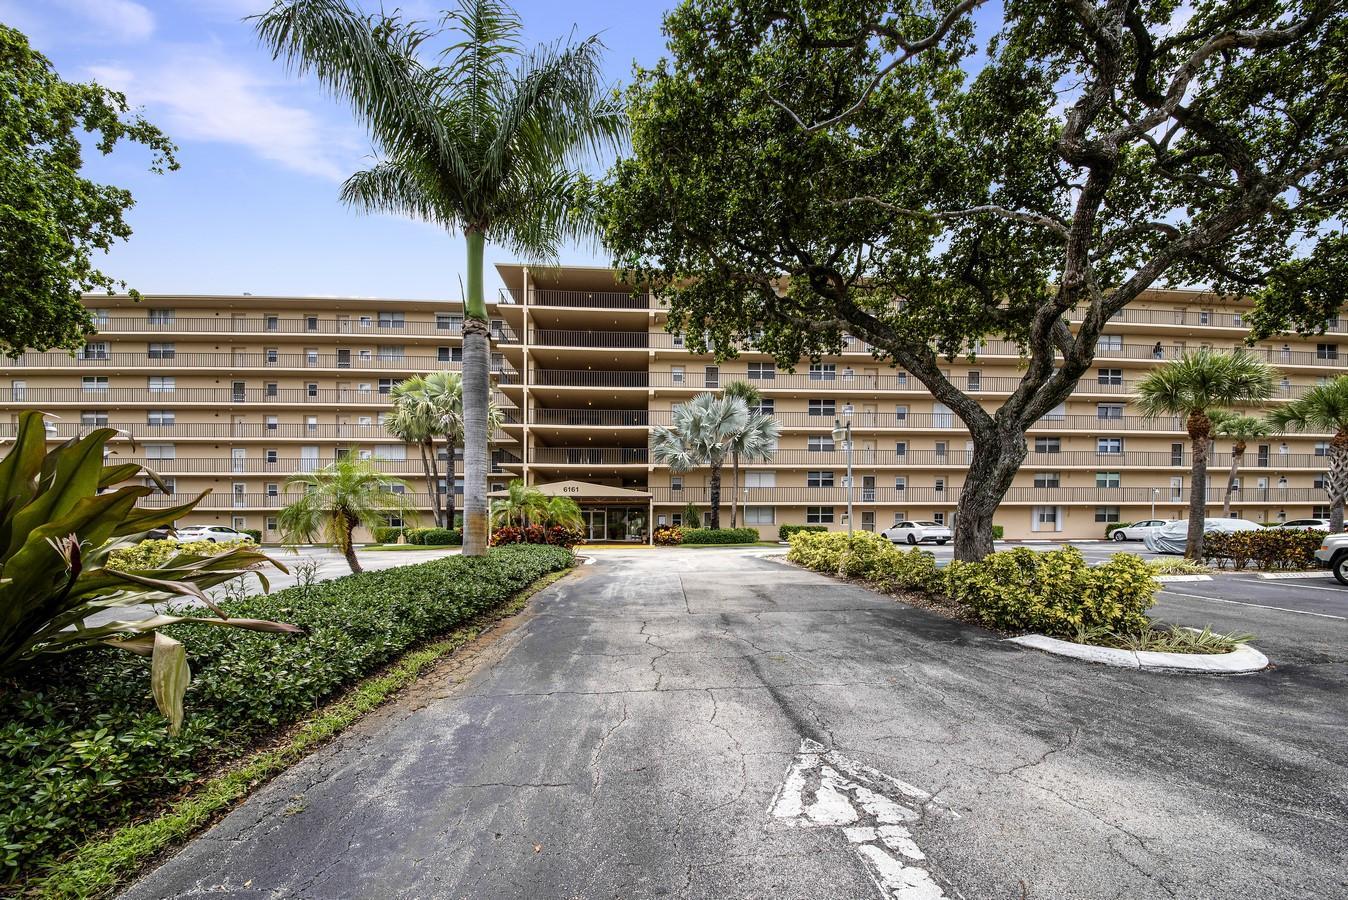 6161 Nw 2nd Avenue #422 Boca Raton, FL 33487